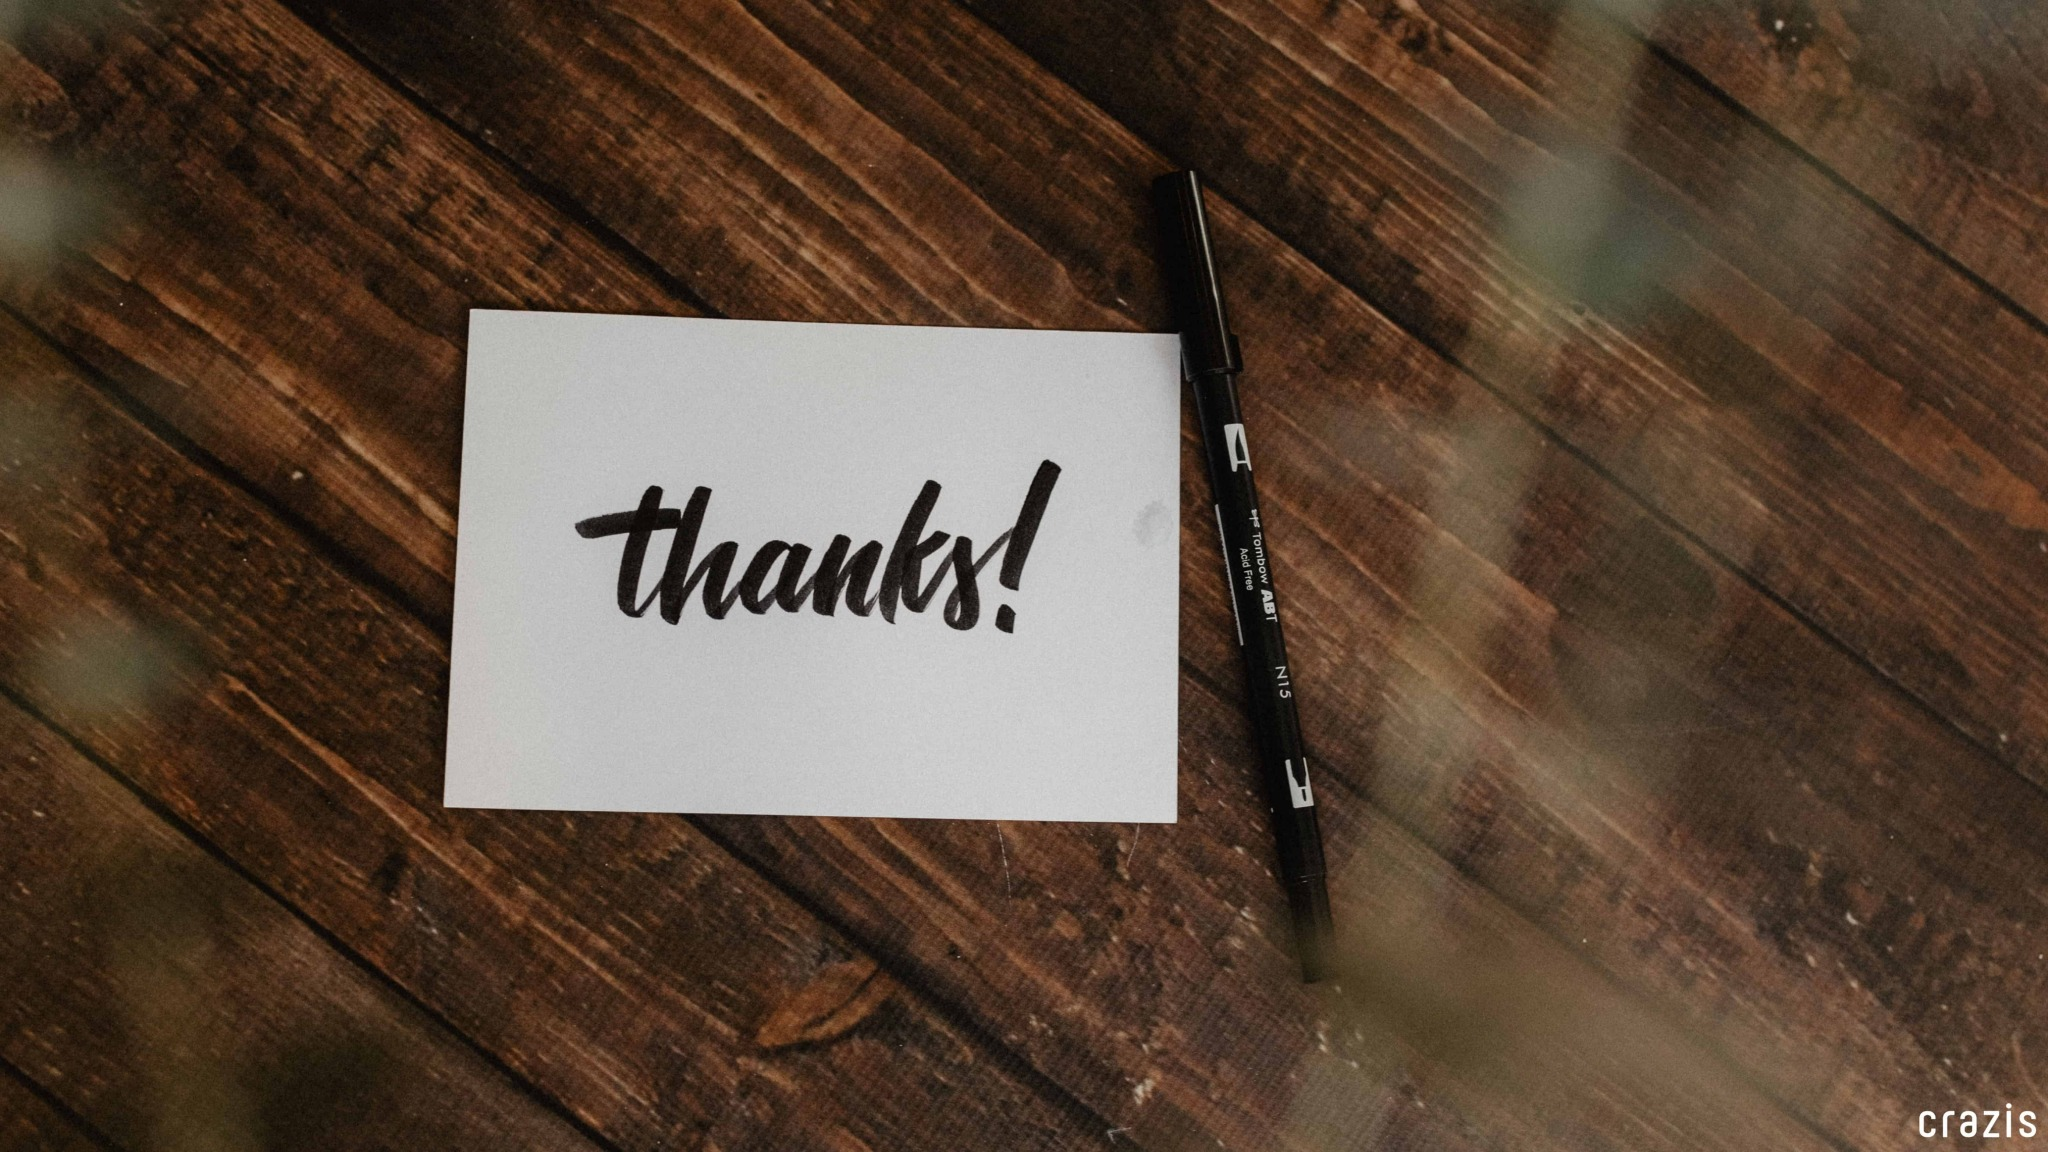 #Lời cảm ơn (crazis.vn)